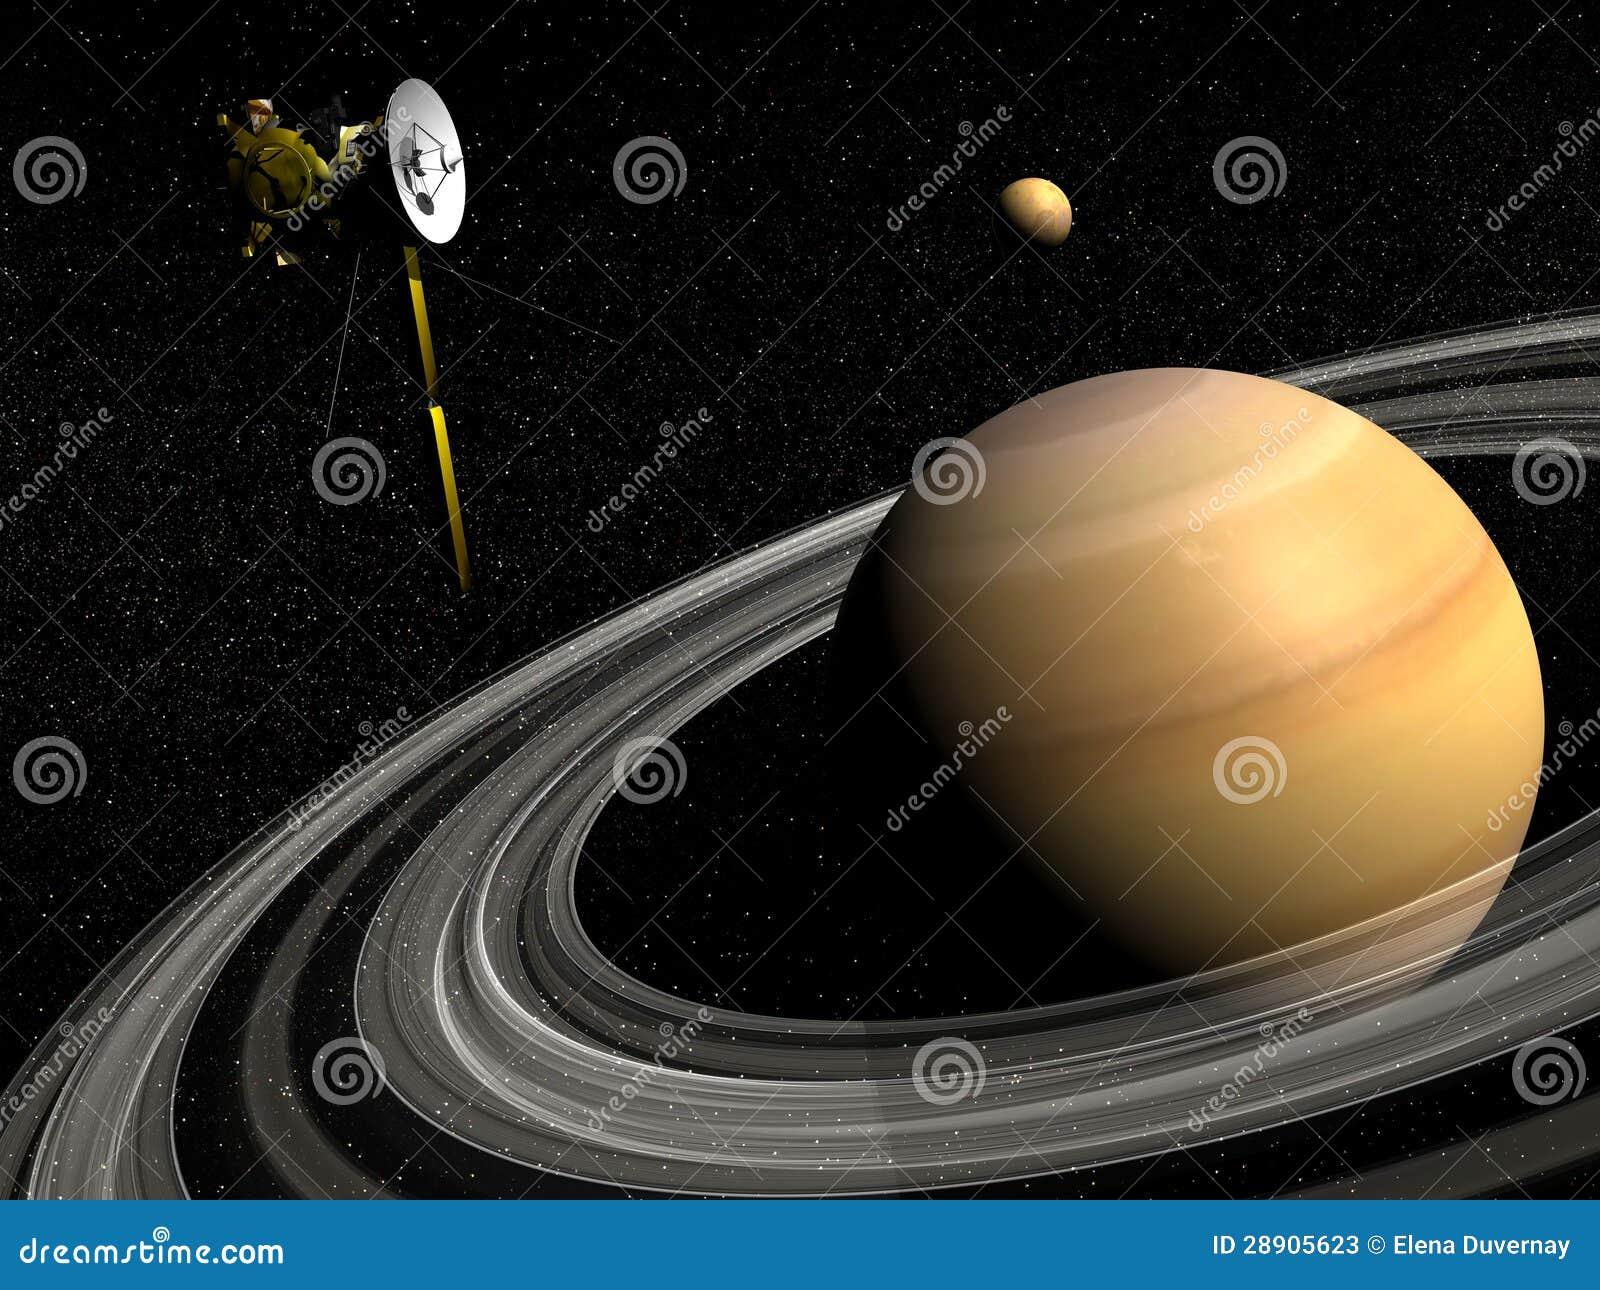 cassini spacecraft near saturn and titan satellite 3d. Black Bedroom Furniture Sets. Home Design Ideas